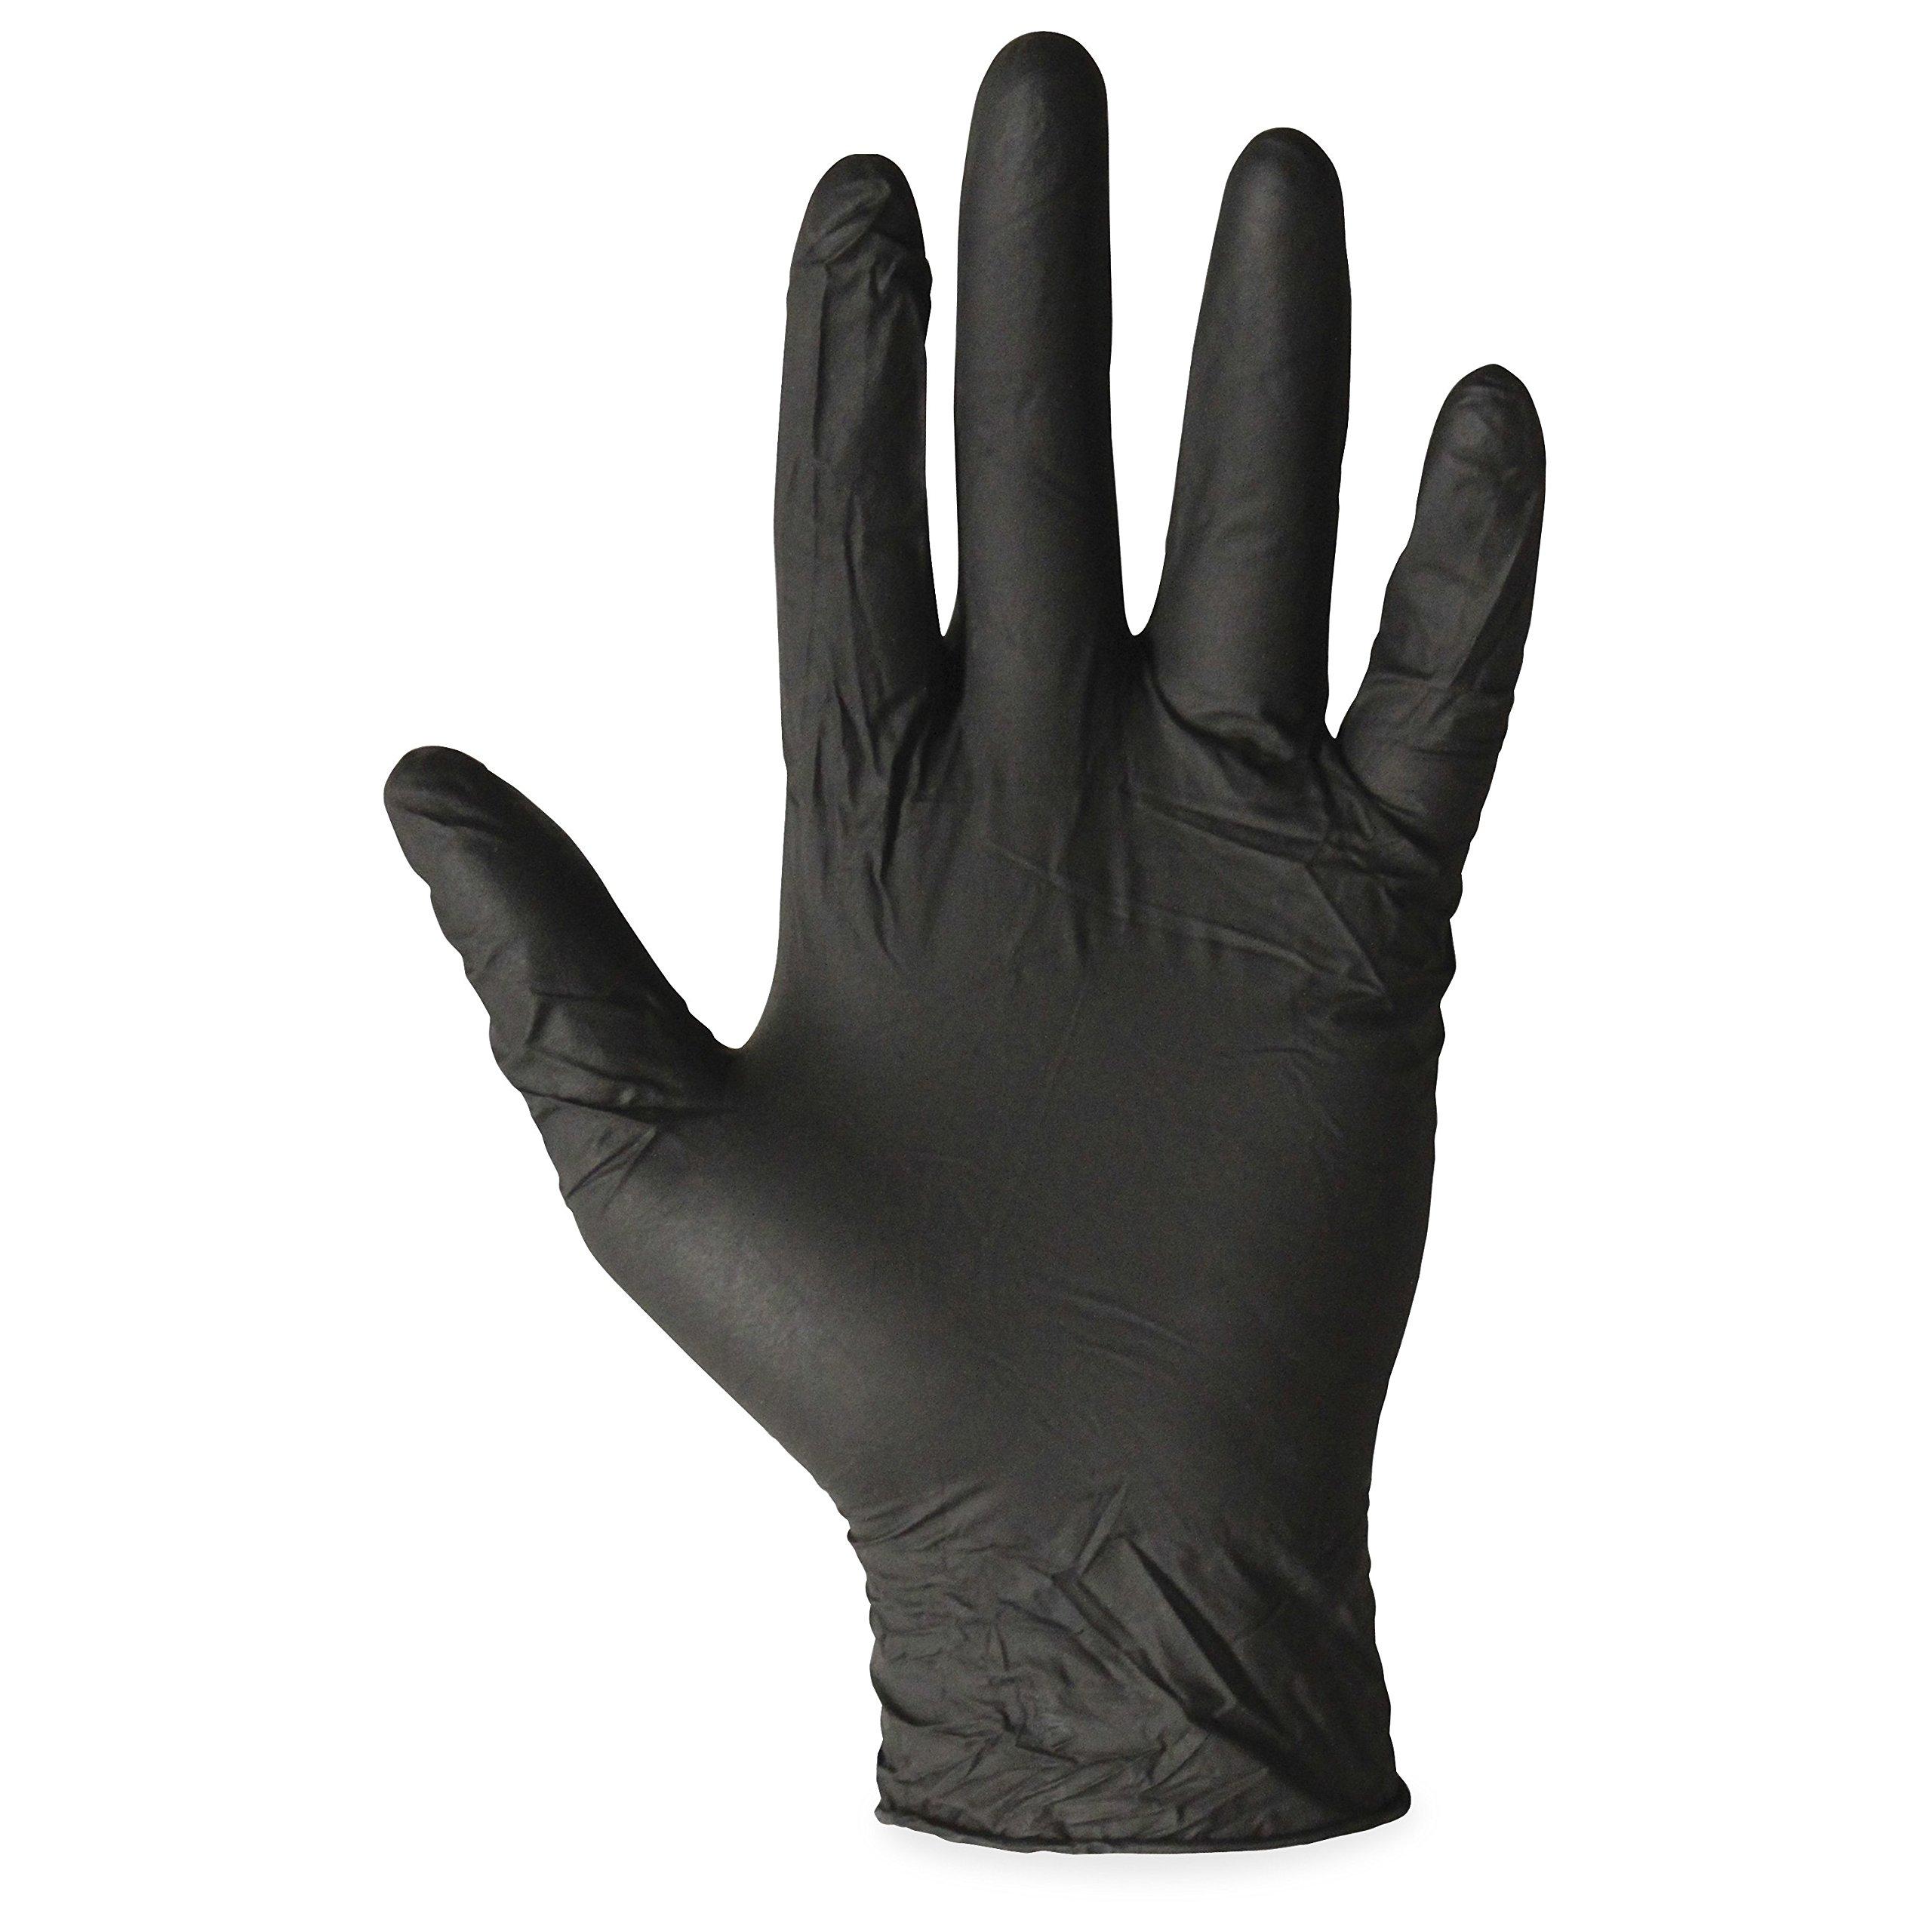 Impact Products 8642M Proguard Disposable Powder-Free General Purpose Nitrile Gloves, Medium, Black, 100Per Box, 10 Boxes Per Case-129379